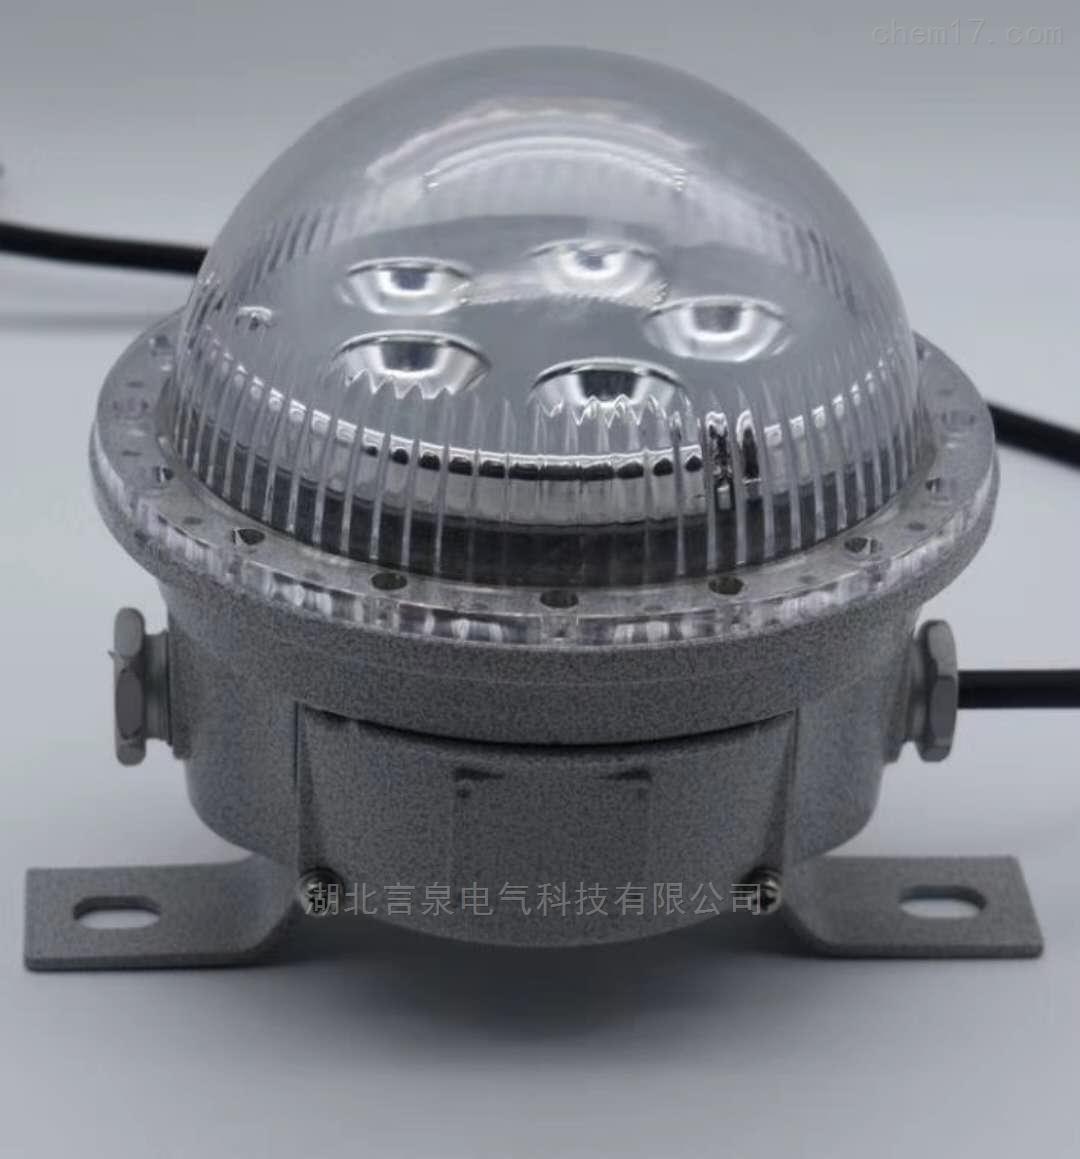 KHD920低功率LED防爆防腐灯免维护节能灯